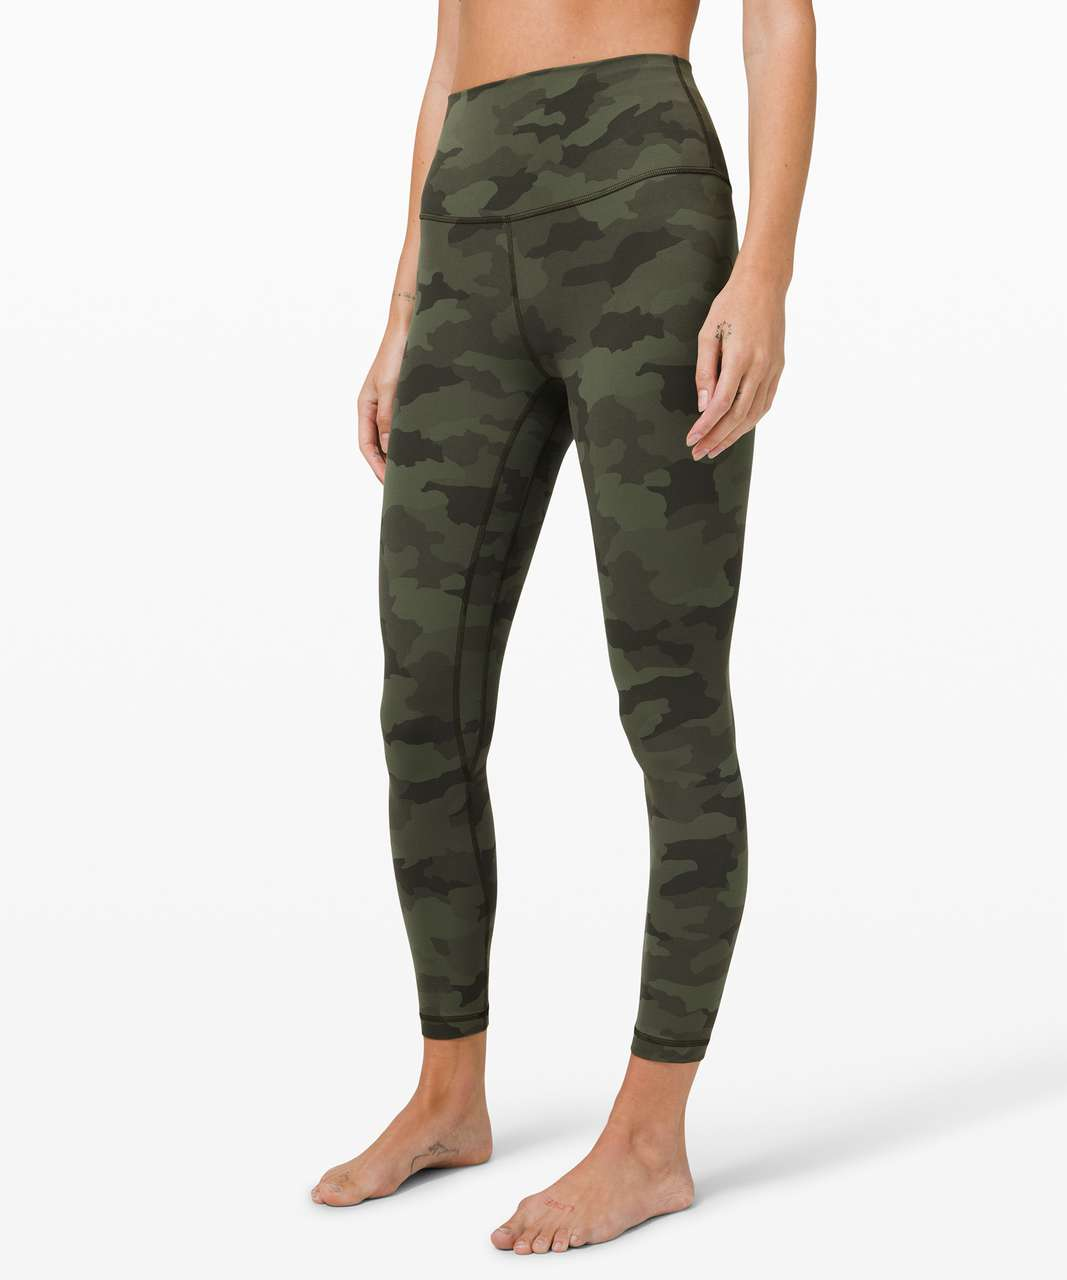 "Lululemon Align Pant II 25"" - Heritage 365 Camo Green Twill Multi"